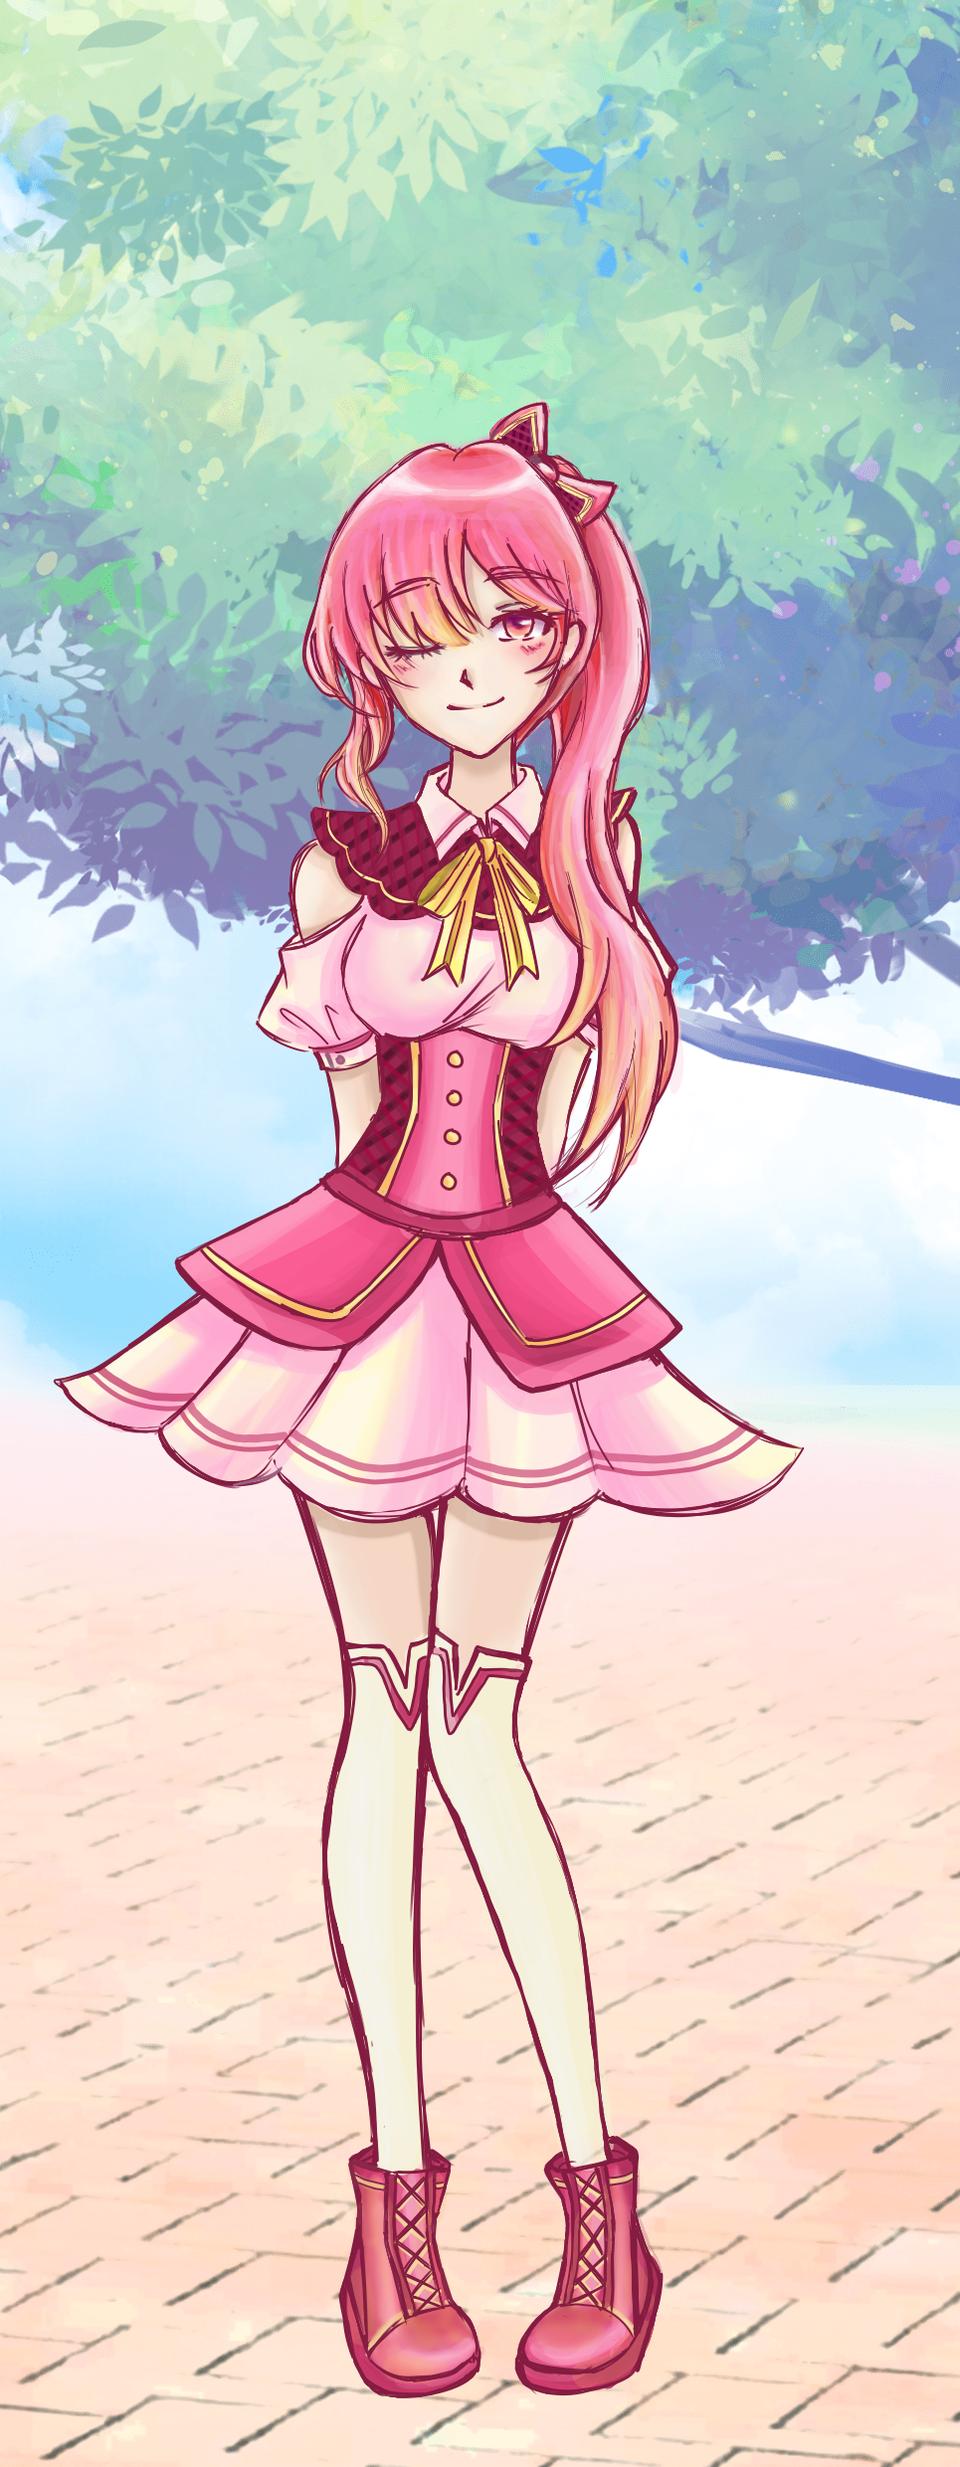 第一次创作人物🥰 Illust of CH.YiNg~ [小鱼] PASTEL_SKETCH2020 oc girl 粉红色 pink